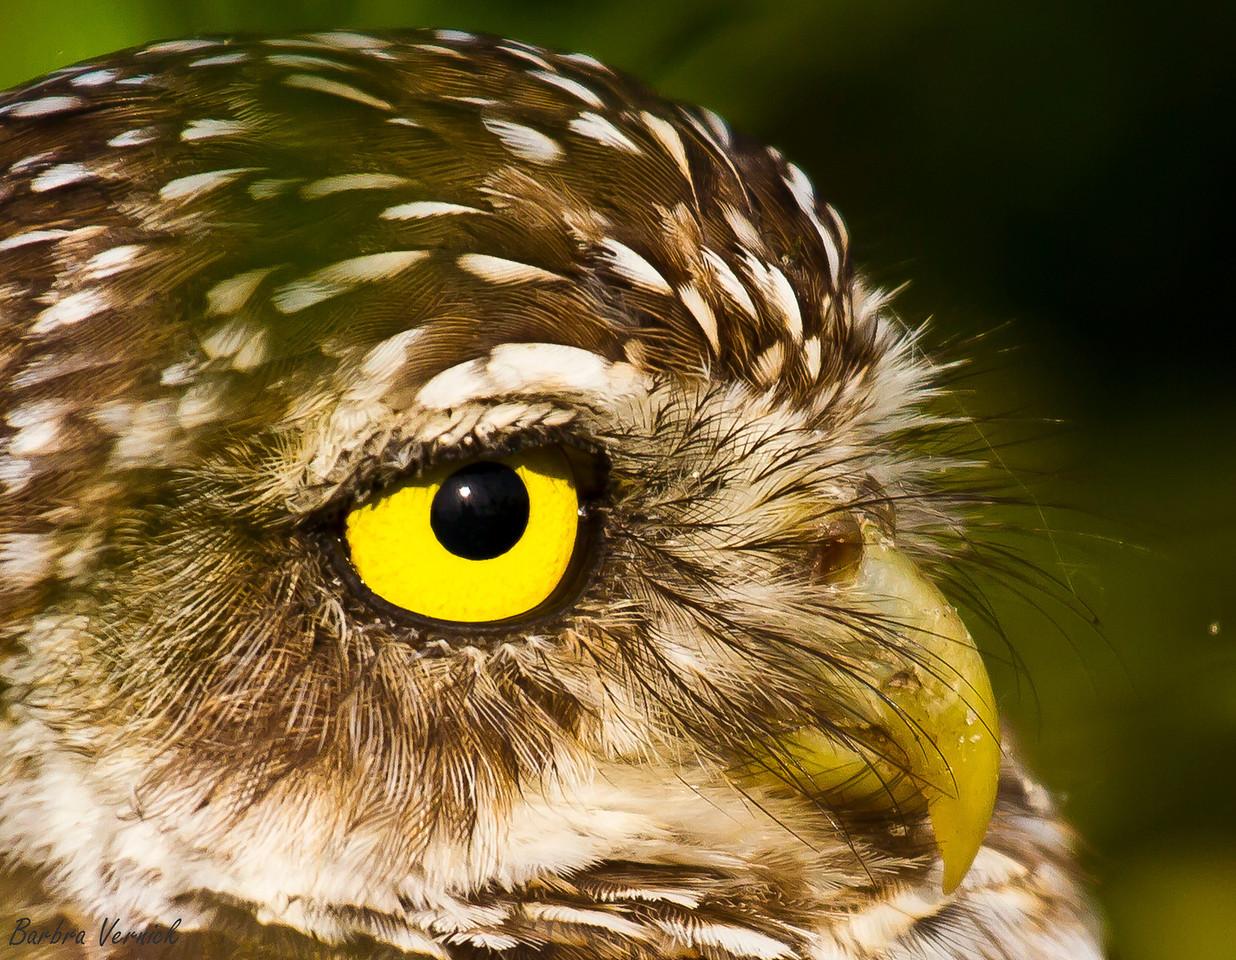 20110903burrowing owls20110903-_MG_8838burrowing owls